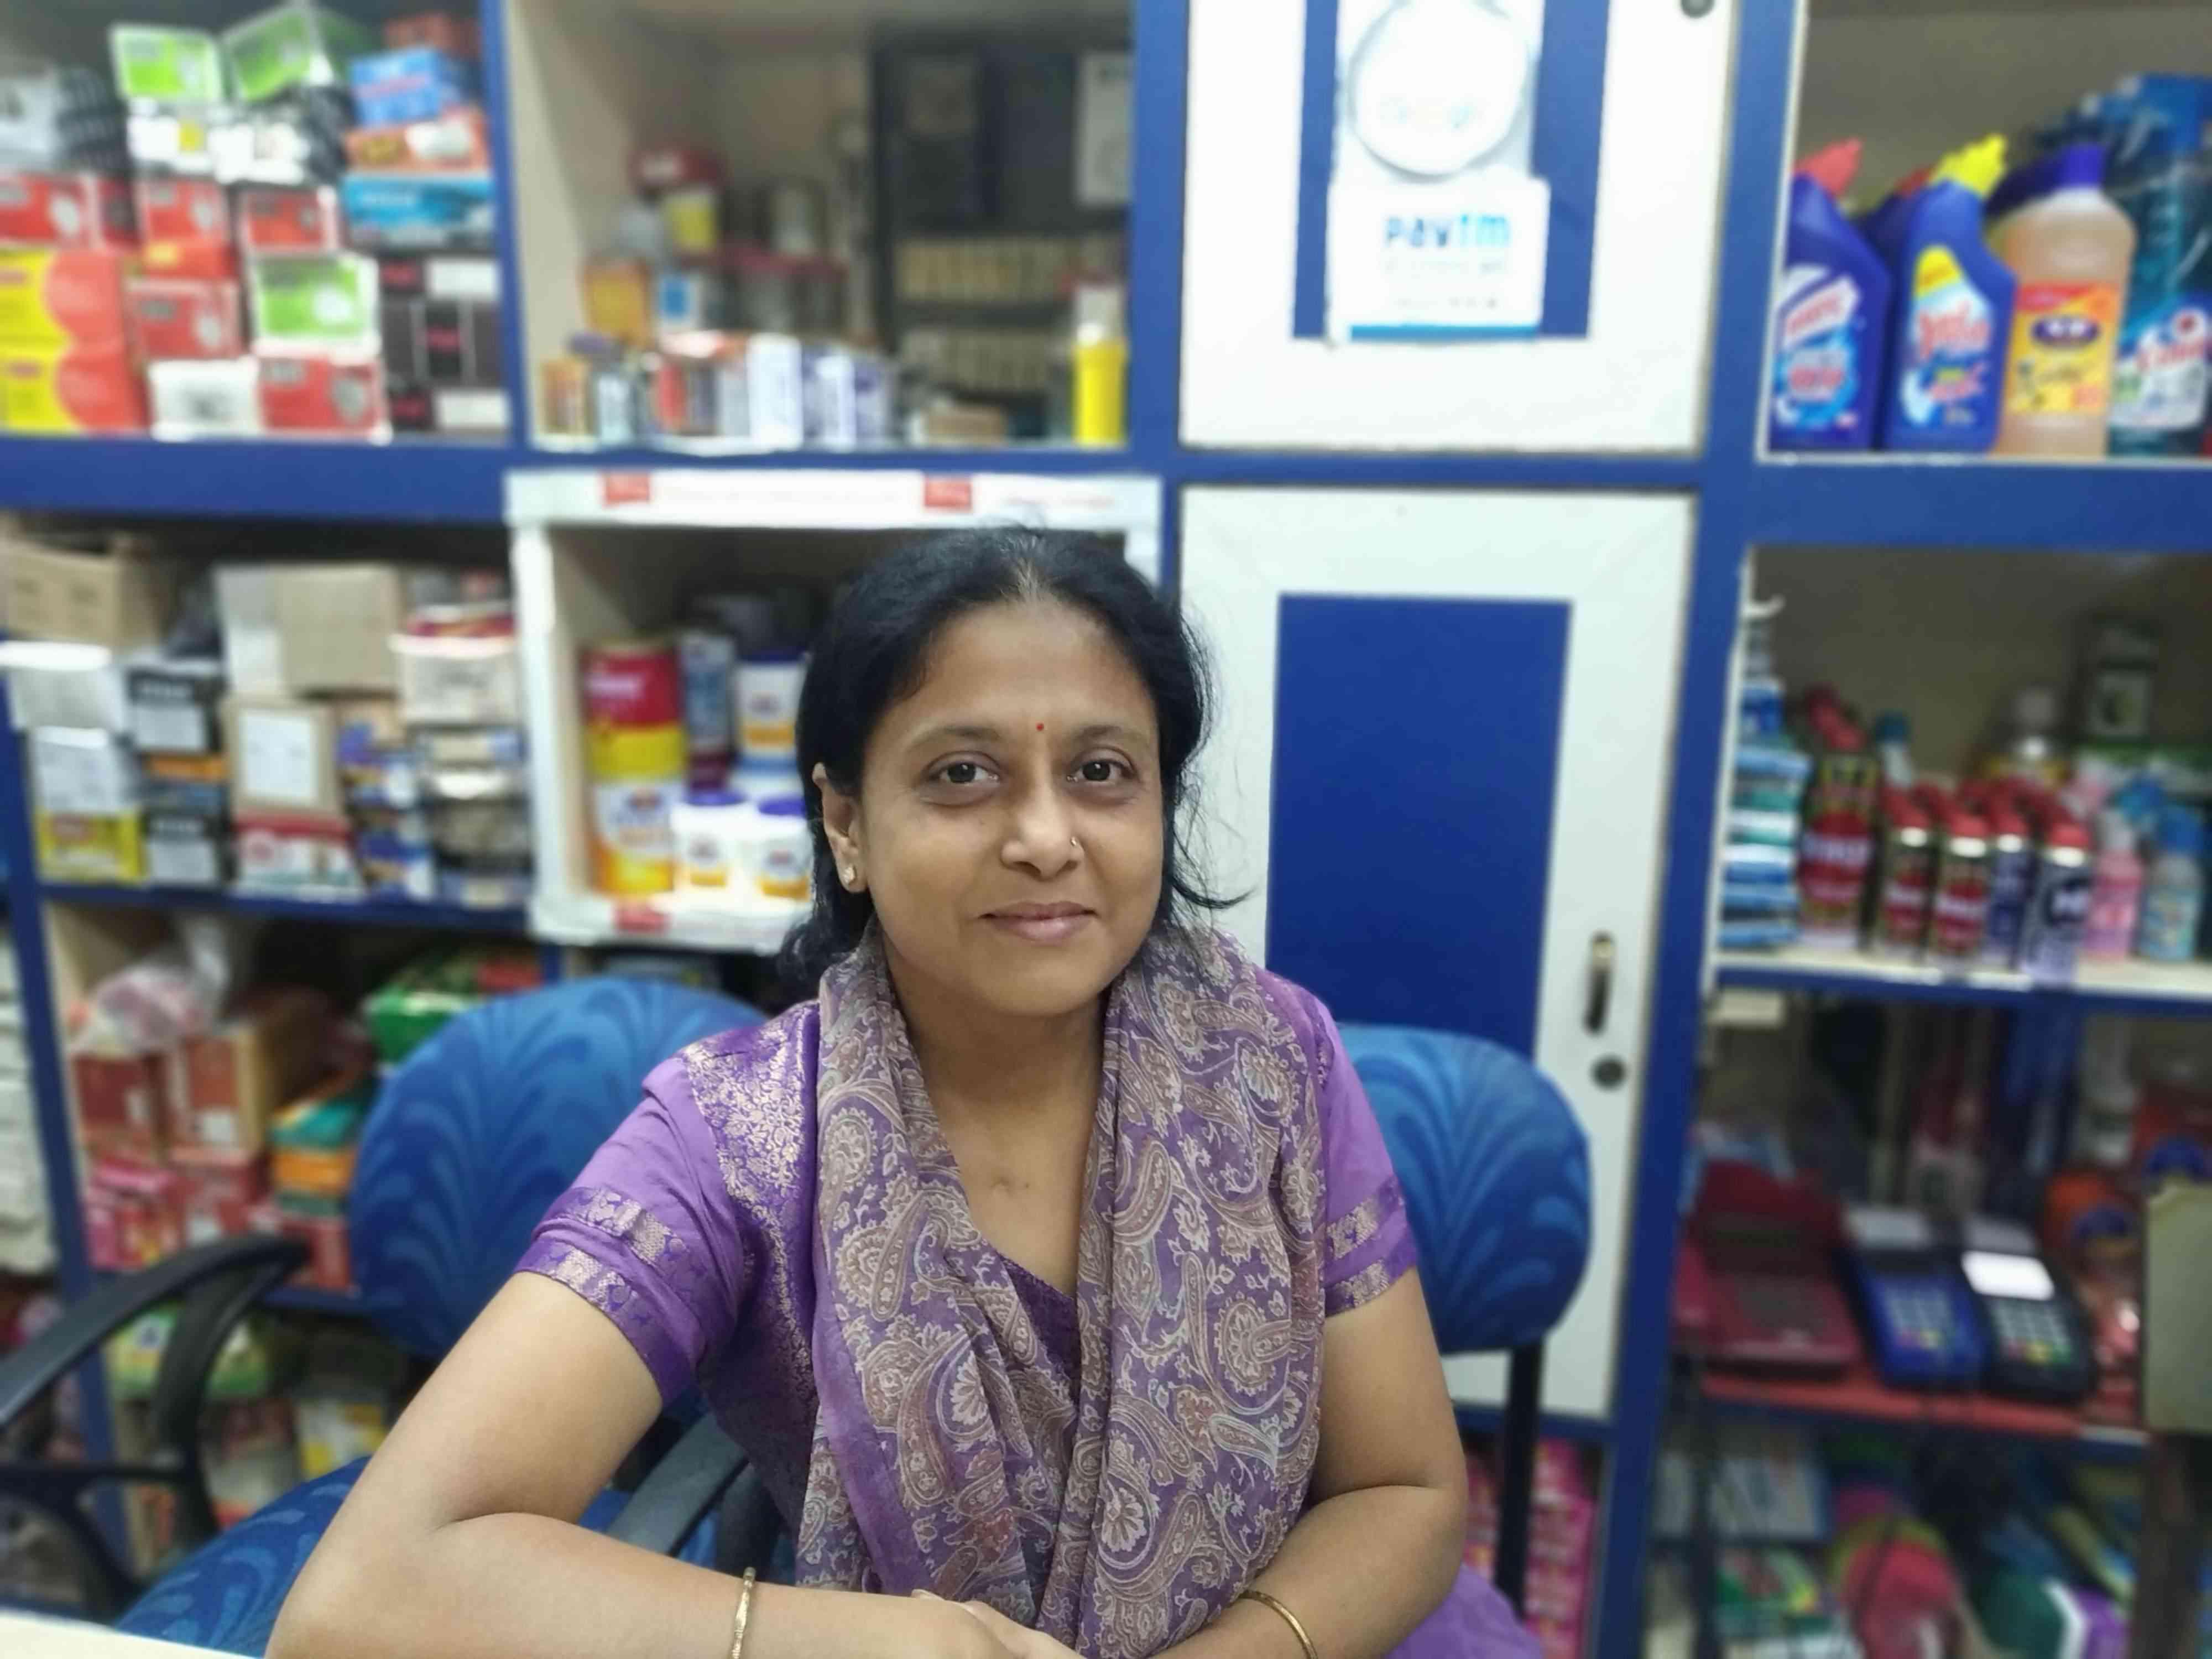 Bharti Ajitsariya runs a departmental store in Guwahati. Photo credit: Arunabh Saikia